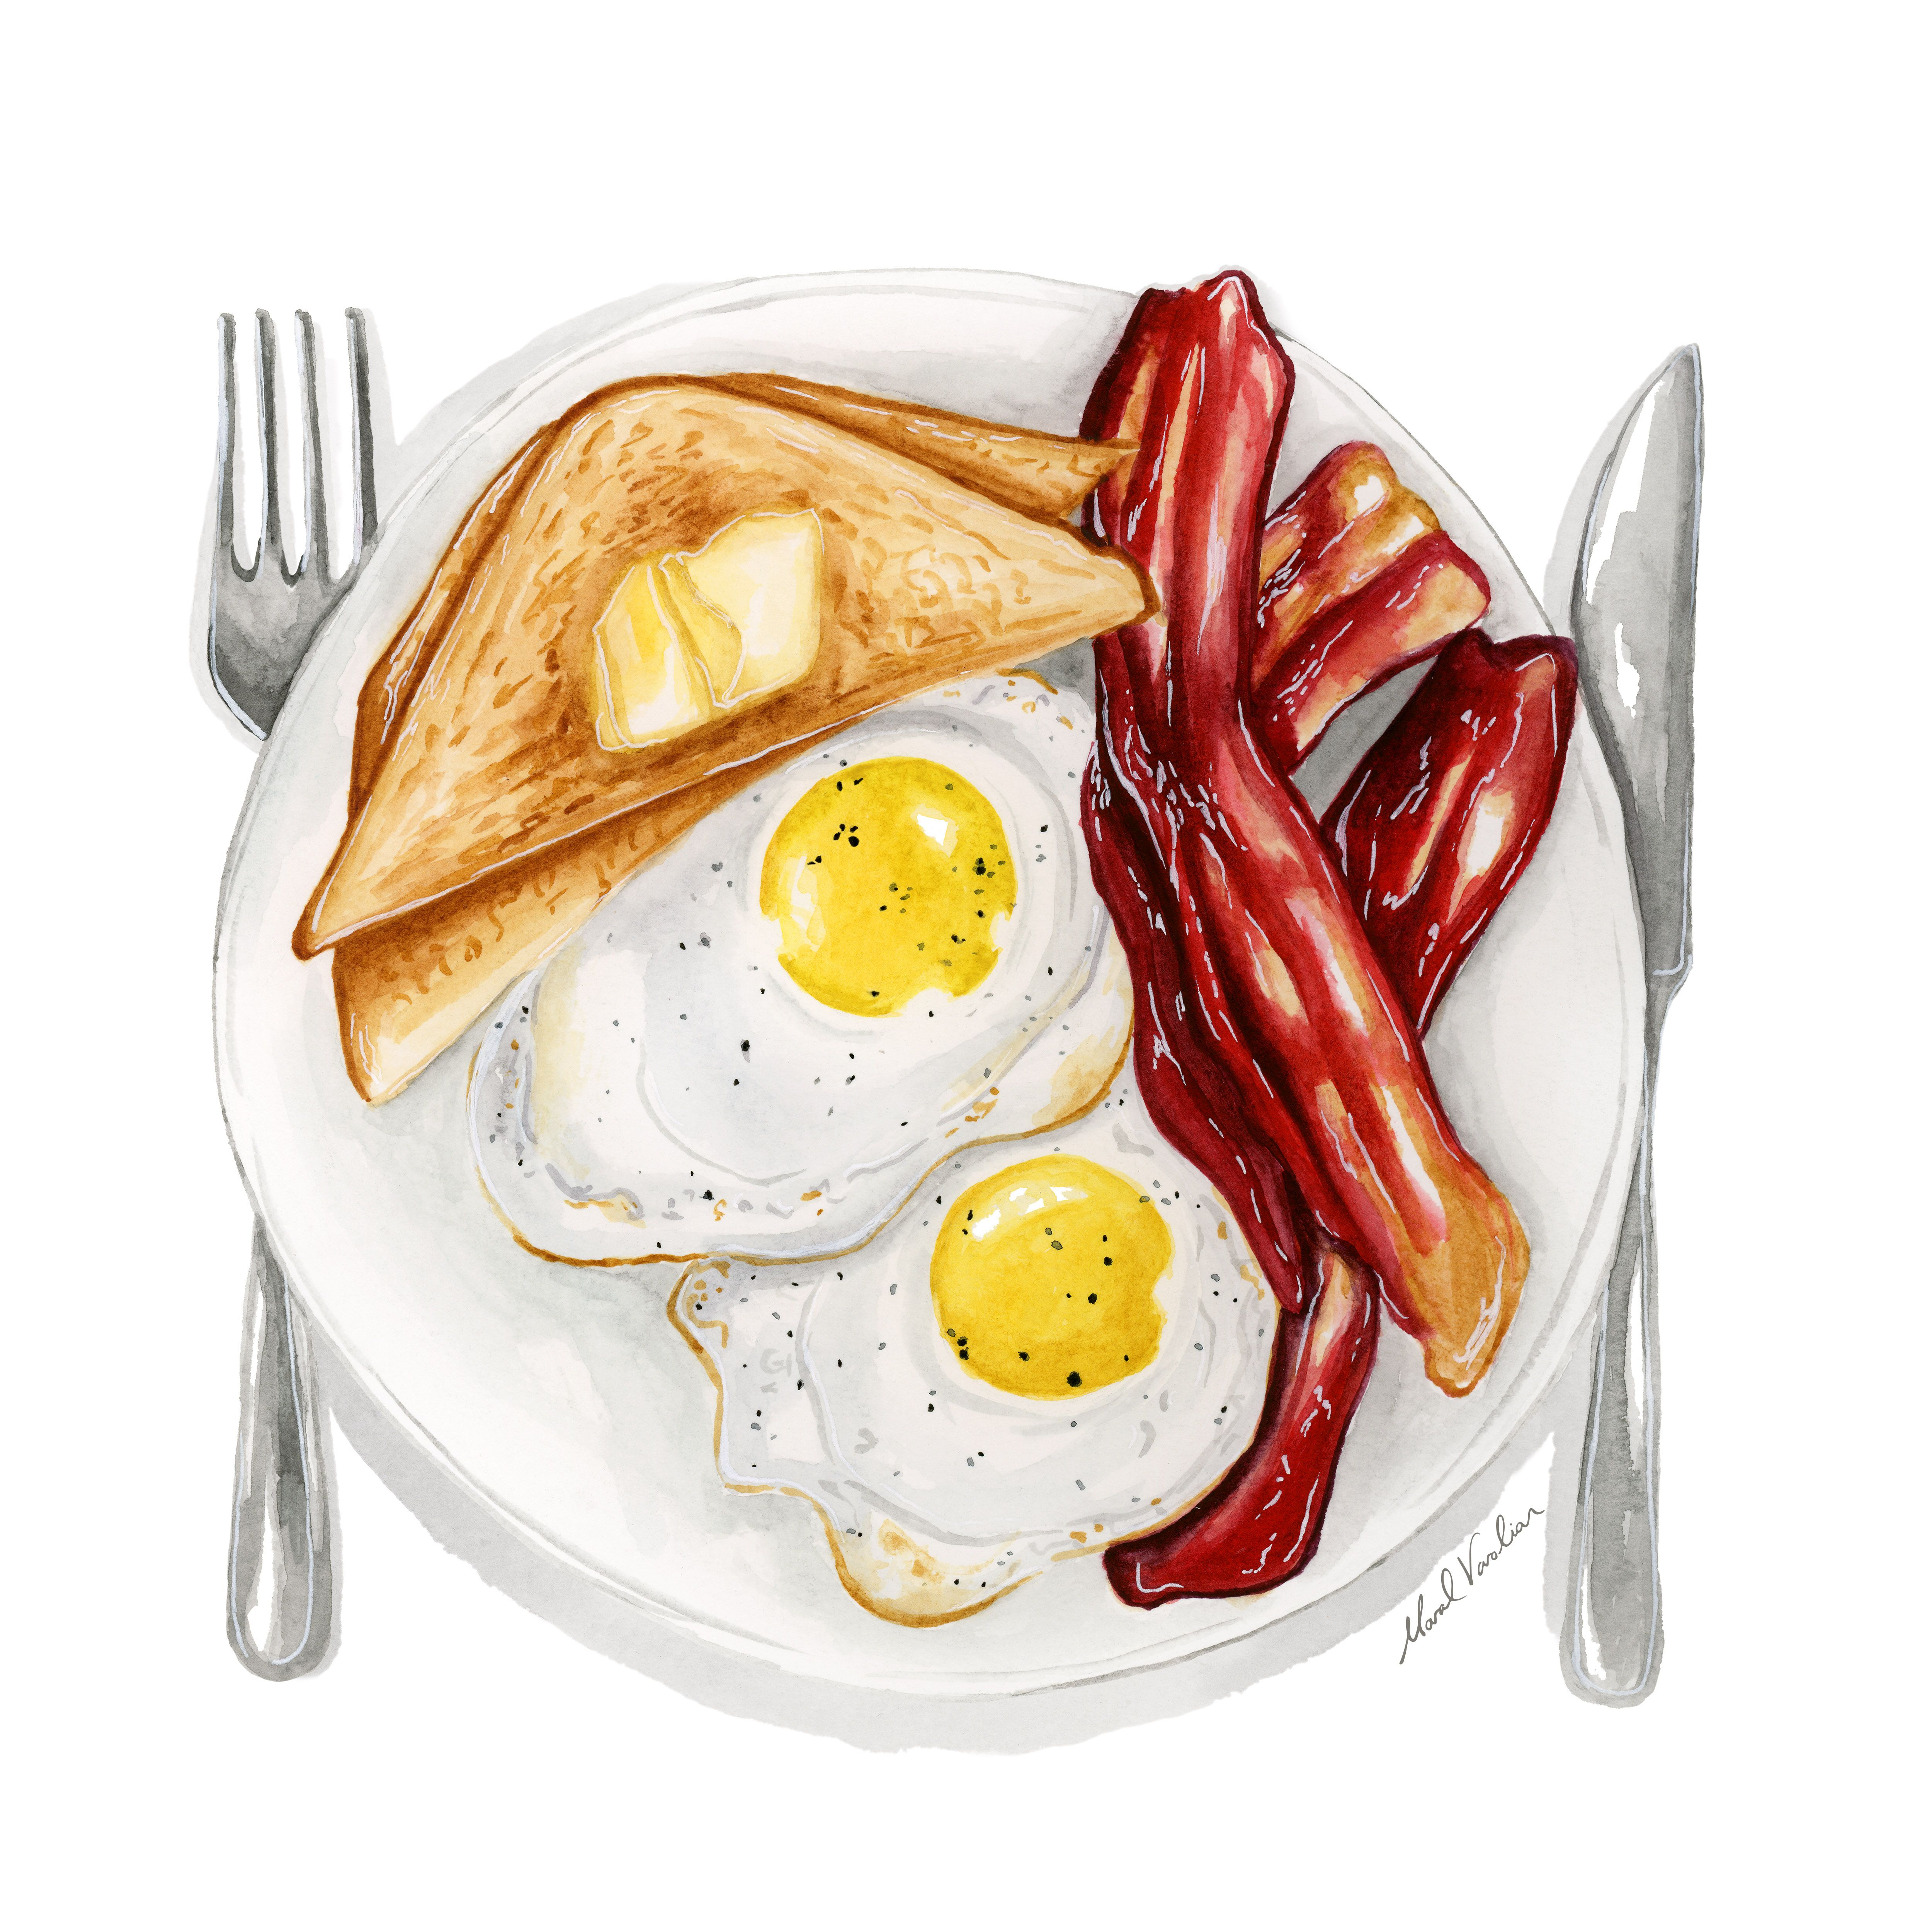 Sunny Side Up Eggs Food Illustration - Maral Varol